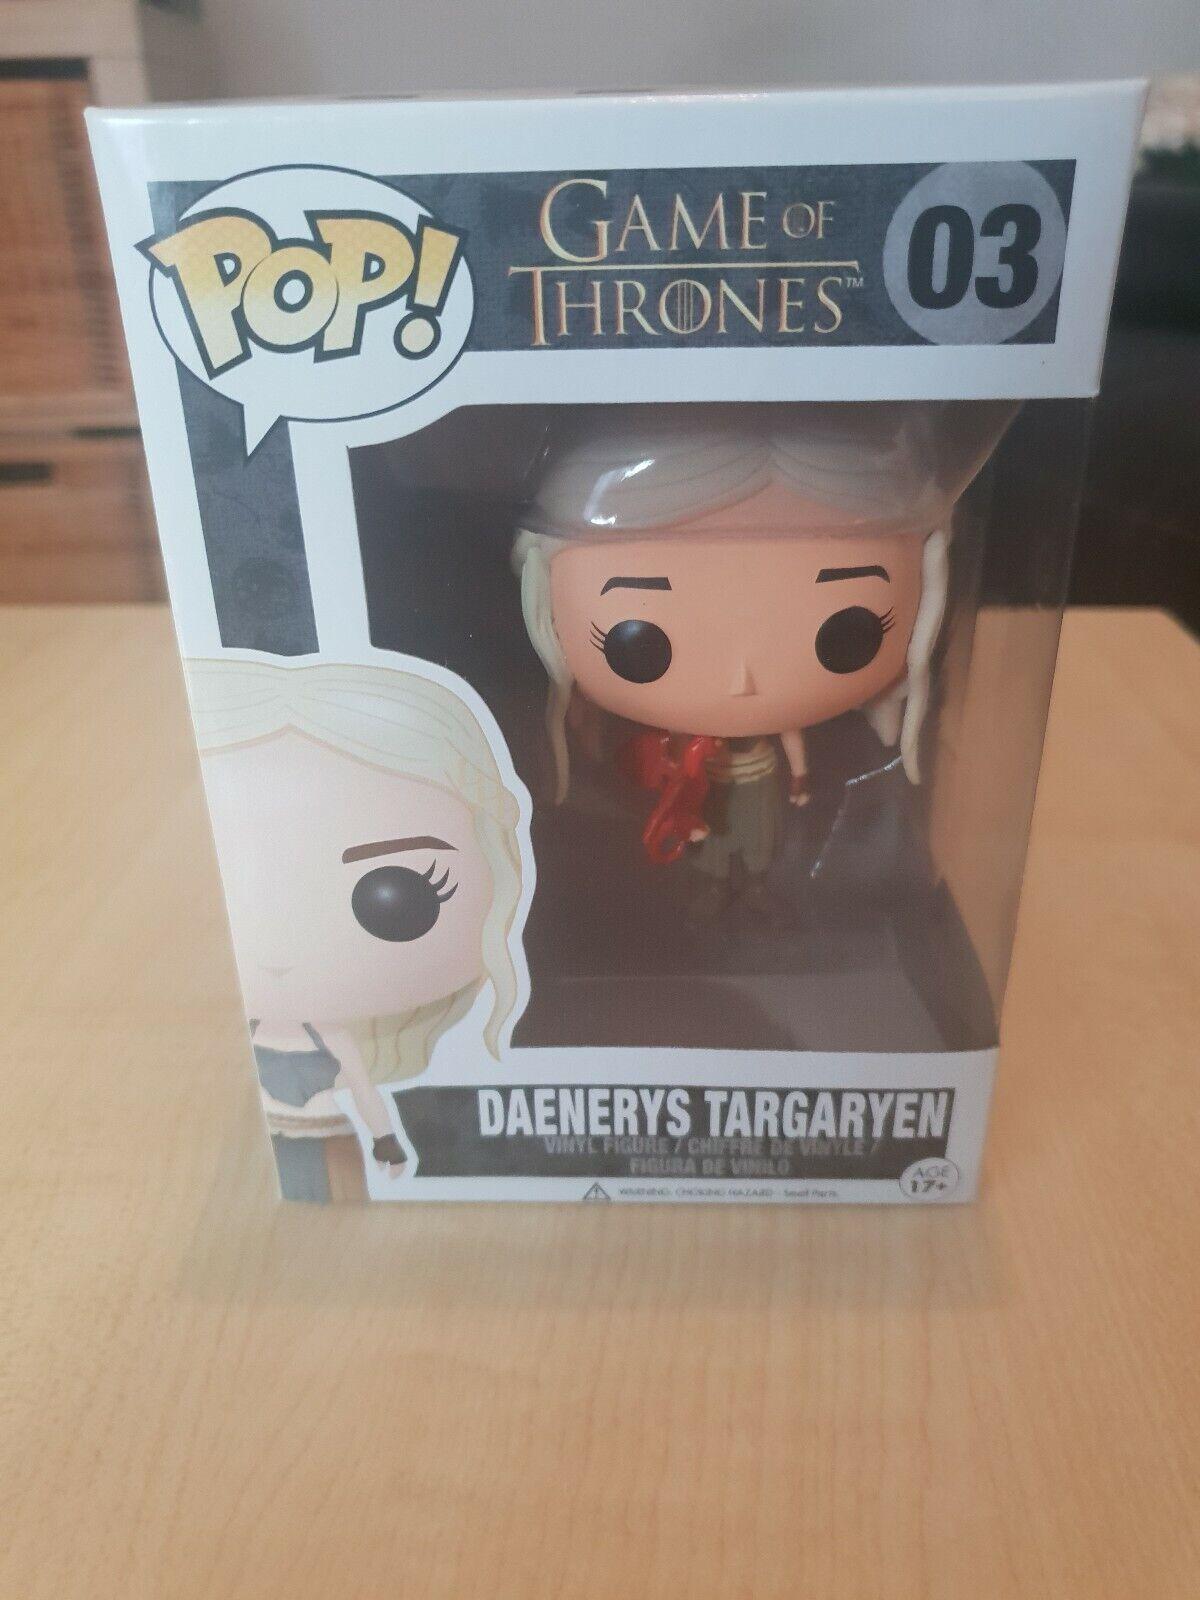 Game of Thrones Funko  Pop Vinyl RARE ERROR  3 Daenerys Targaryen With rouge Dragon  livraison rapide